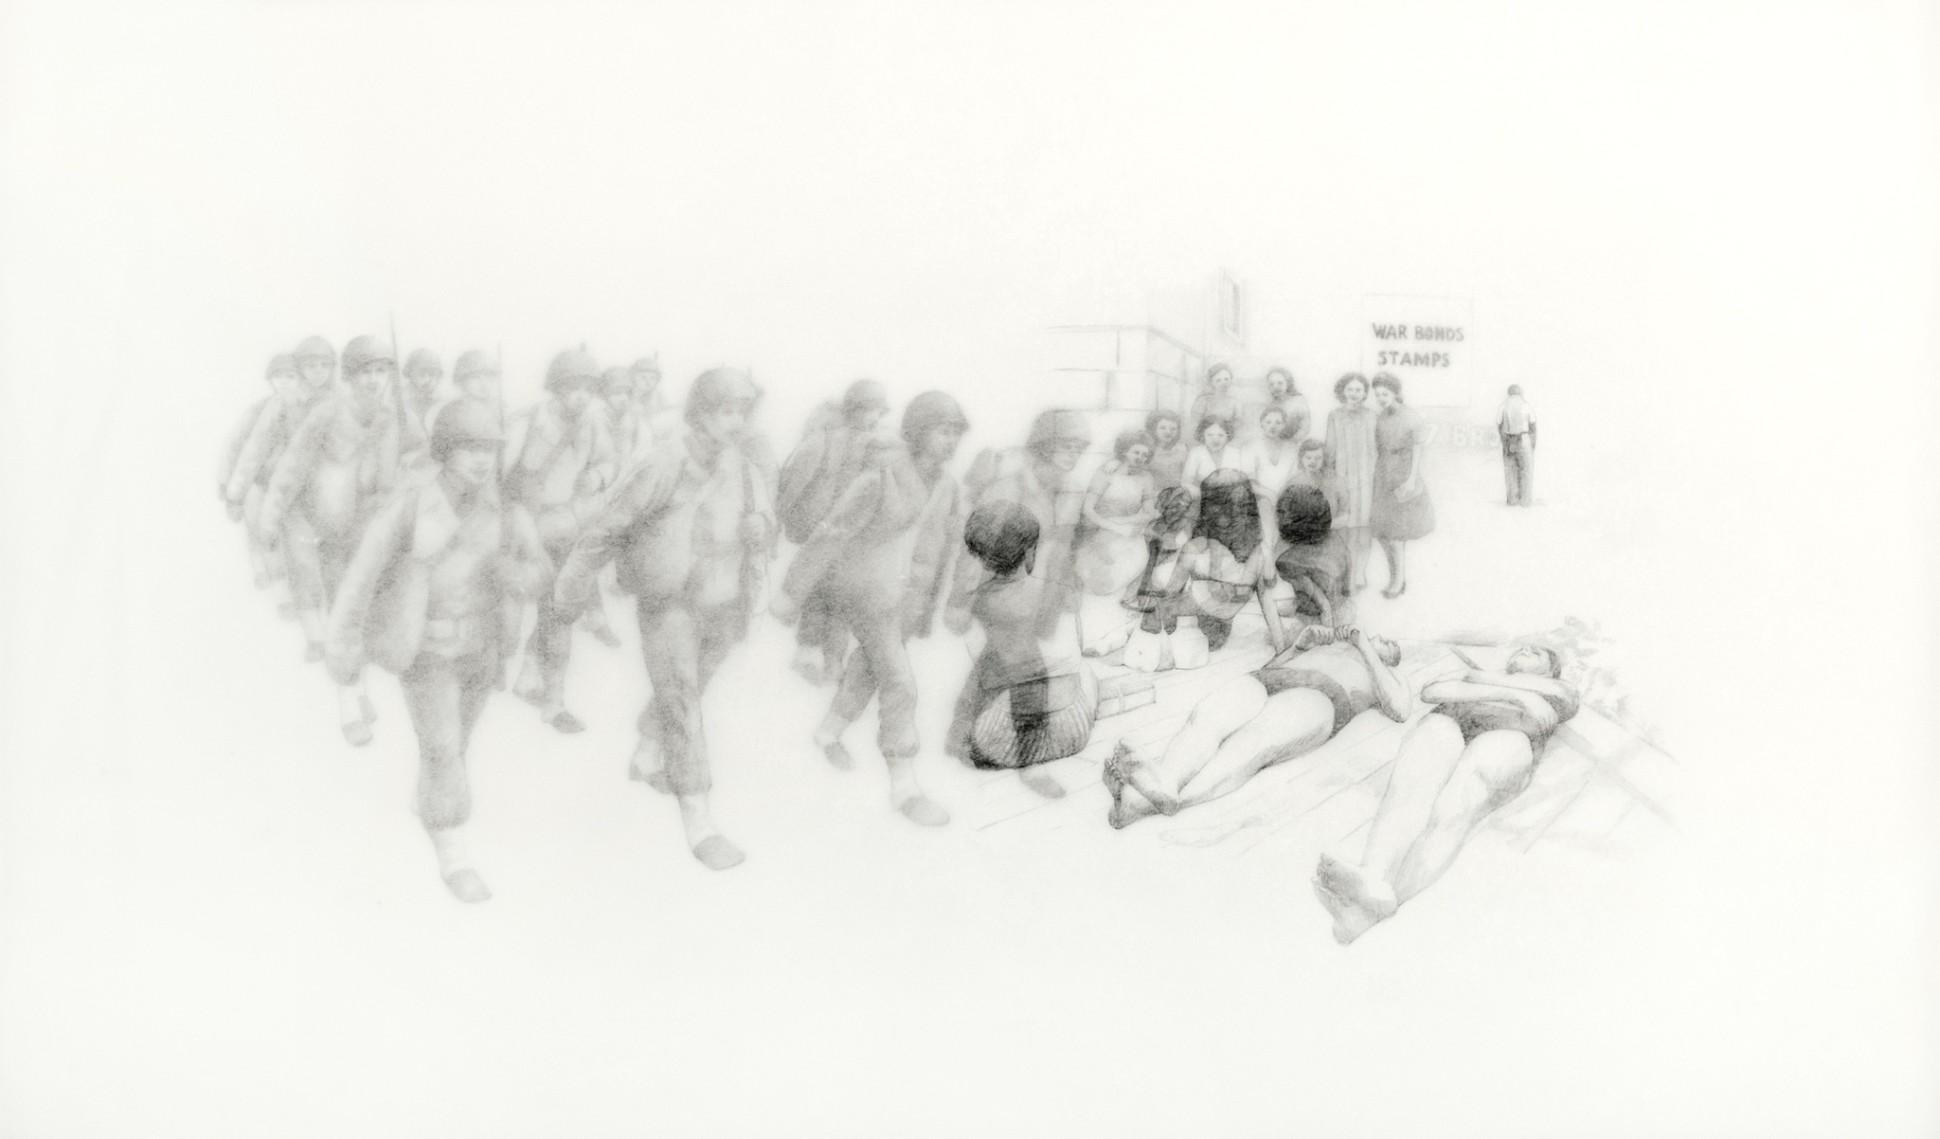 Rania Bellou Confession of a Stolen Kiss V, 2014 Pencil on Kozo Paper 62.6 x 90.6 cm. / 24 5/8 x 35 5/8 in.